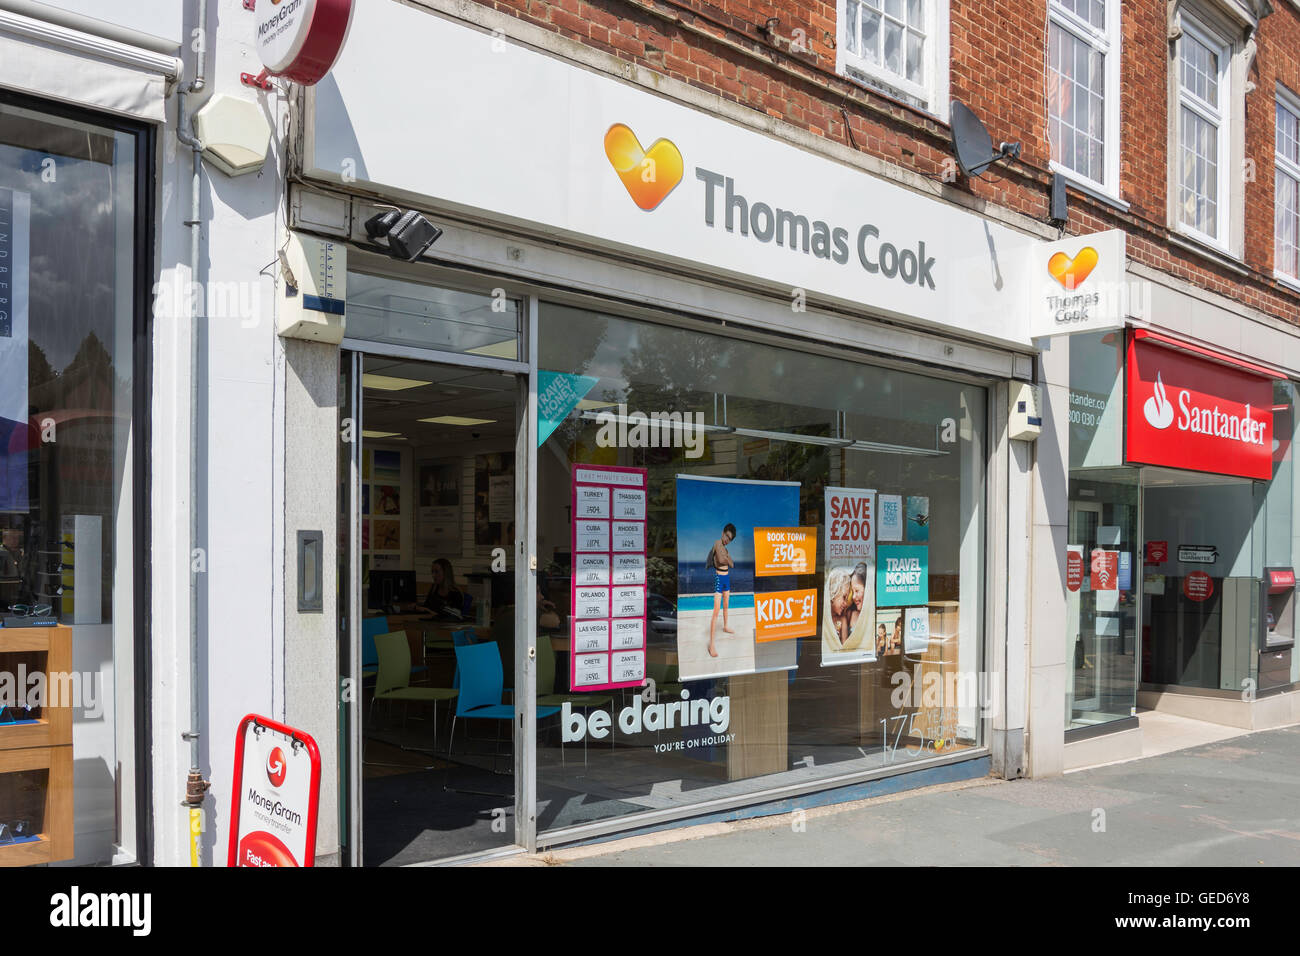 Thomas Cook Travel agent, Banstead High Street, Banstead, Surrey, England, Regno Unito Immagini Stock